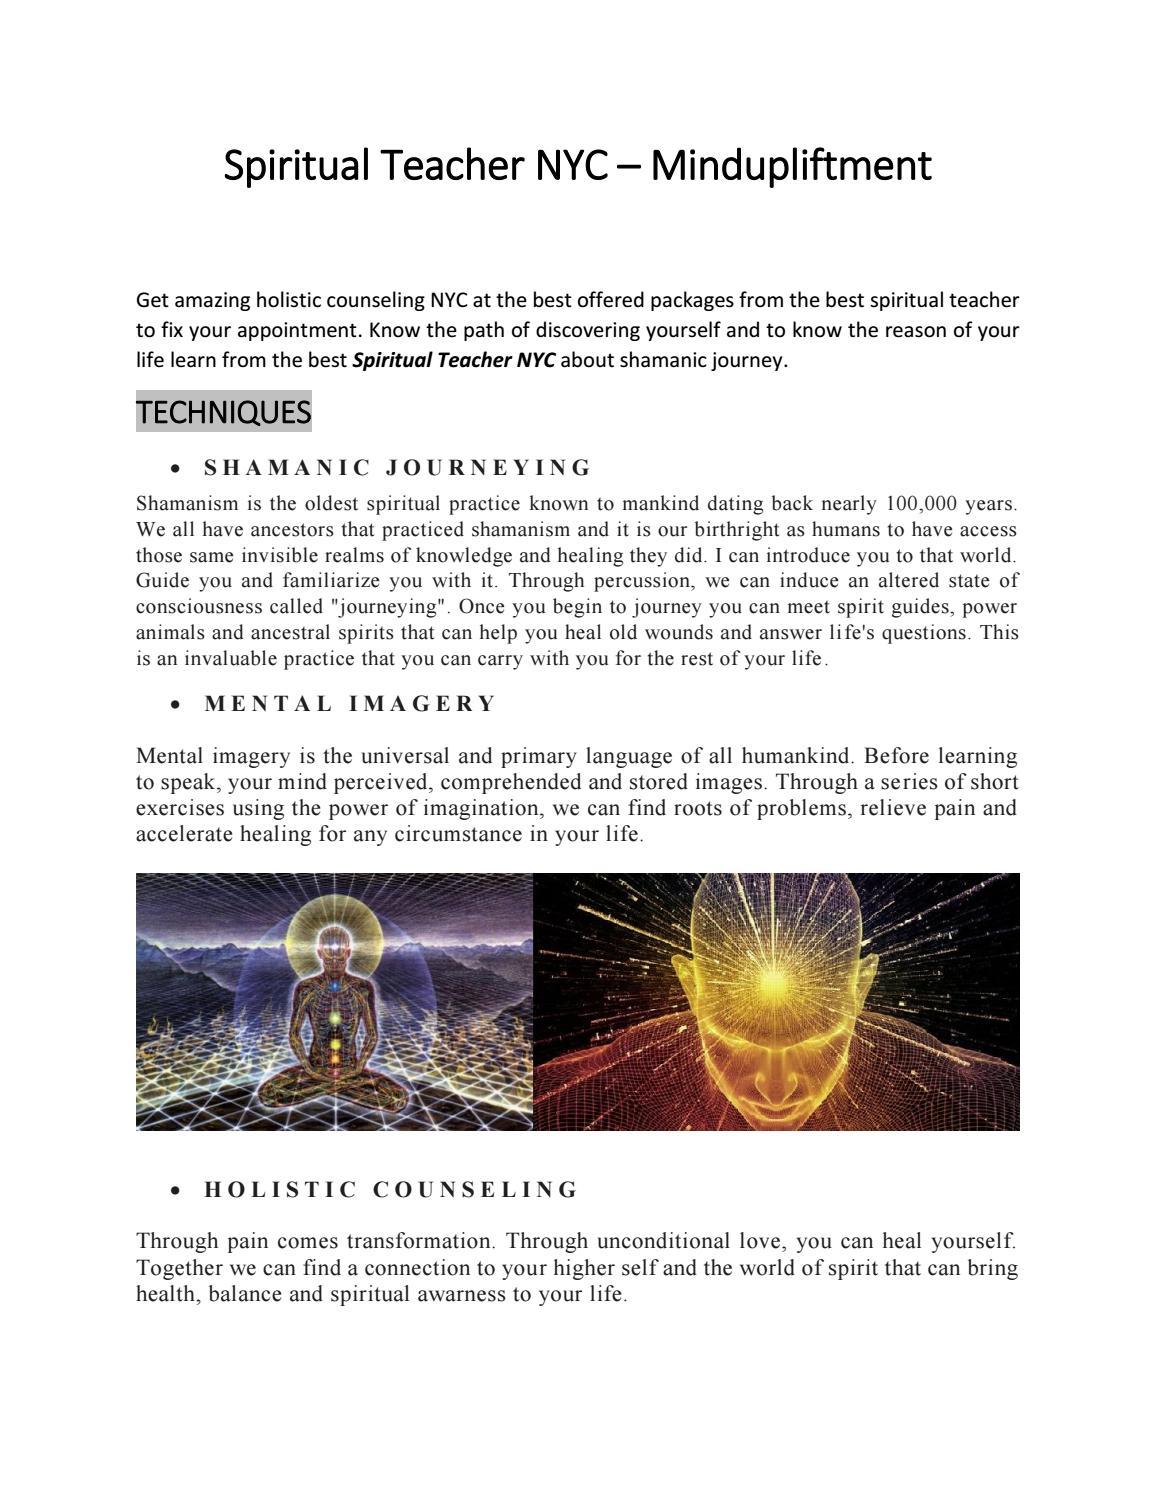 Spiritual Teacher NYC – Mindupliftment by MindUpLiftment - issuu